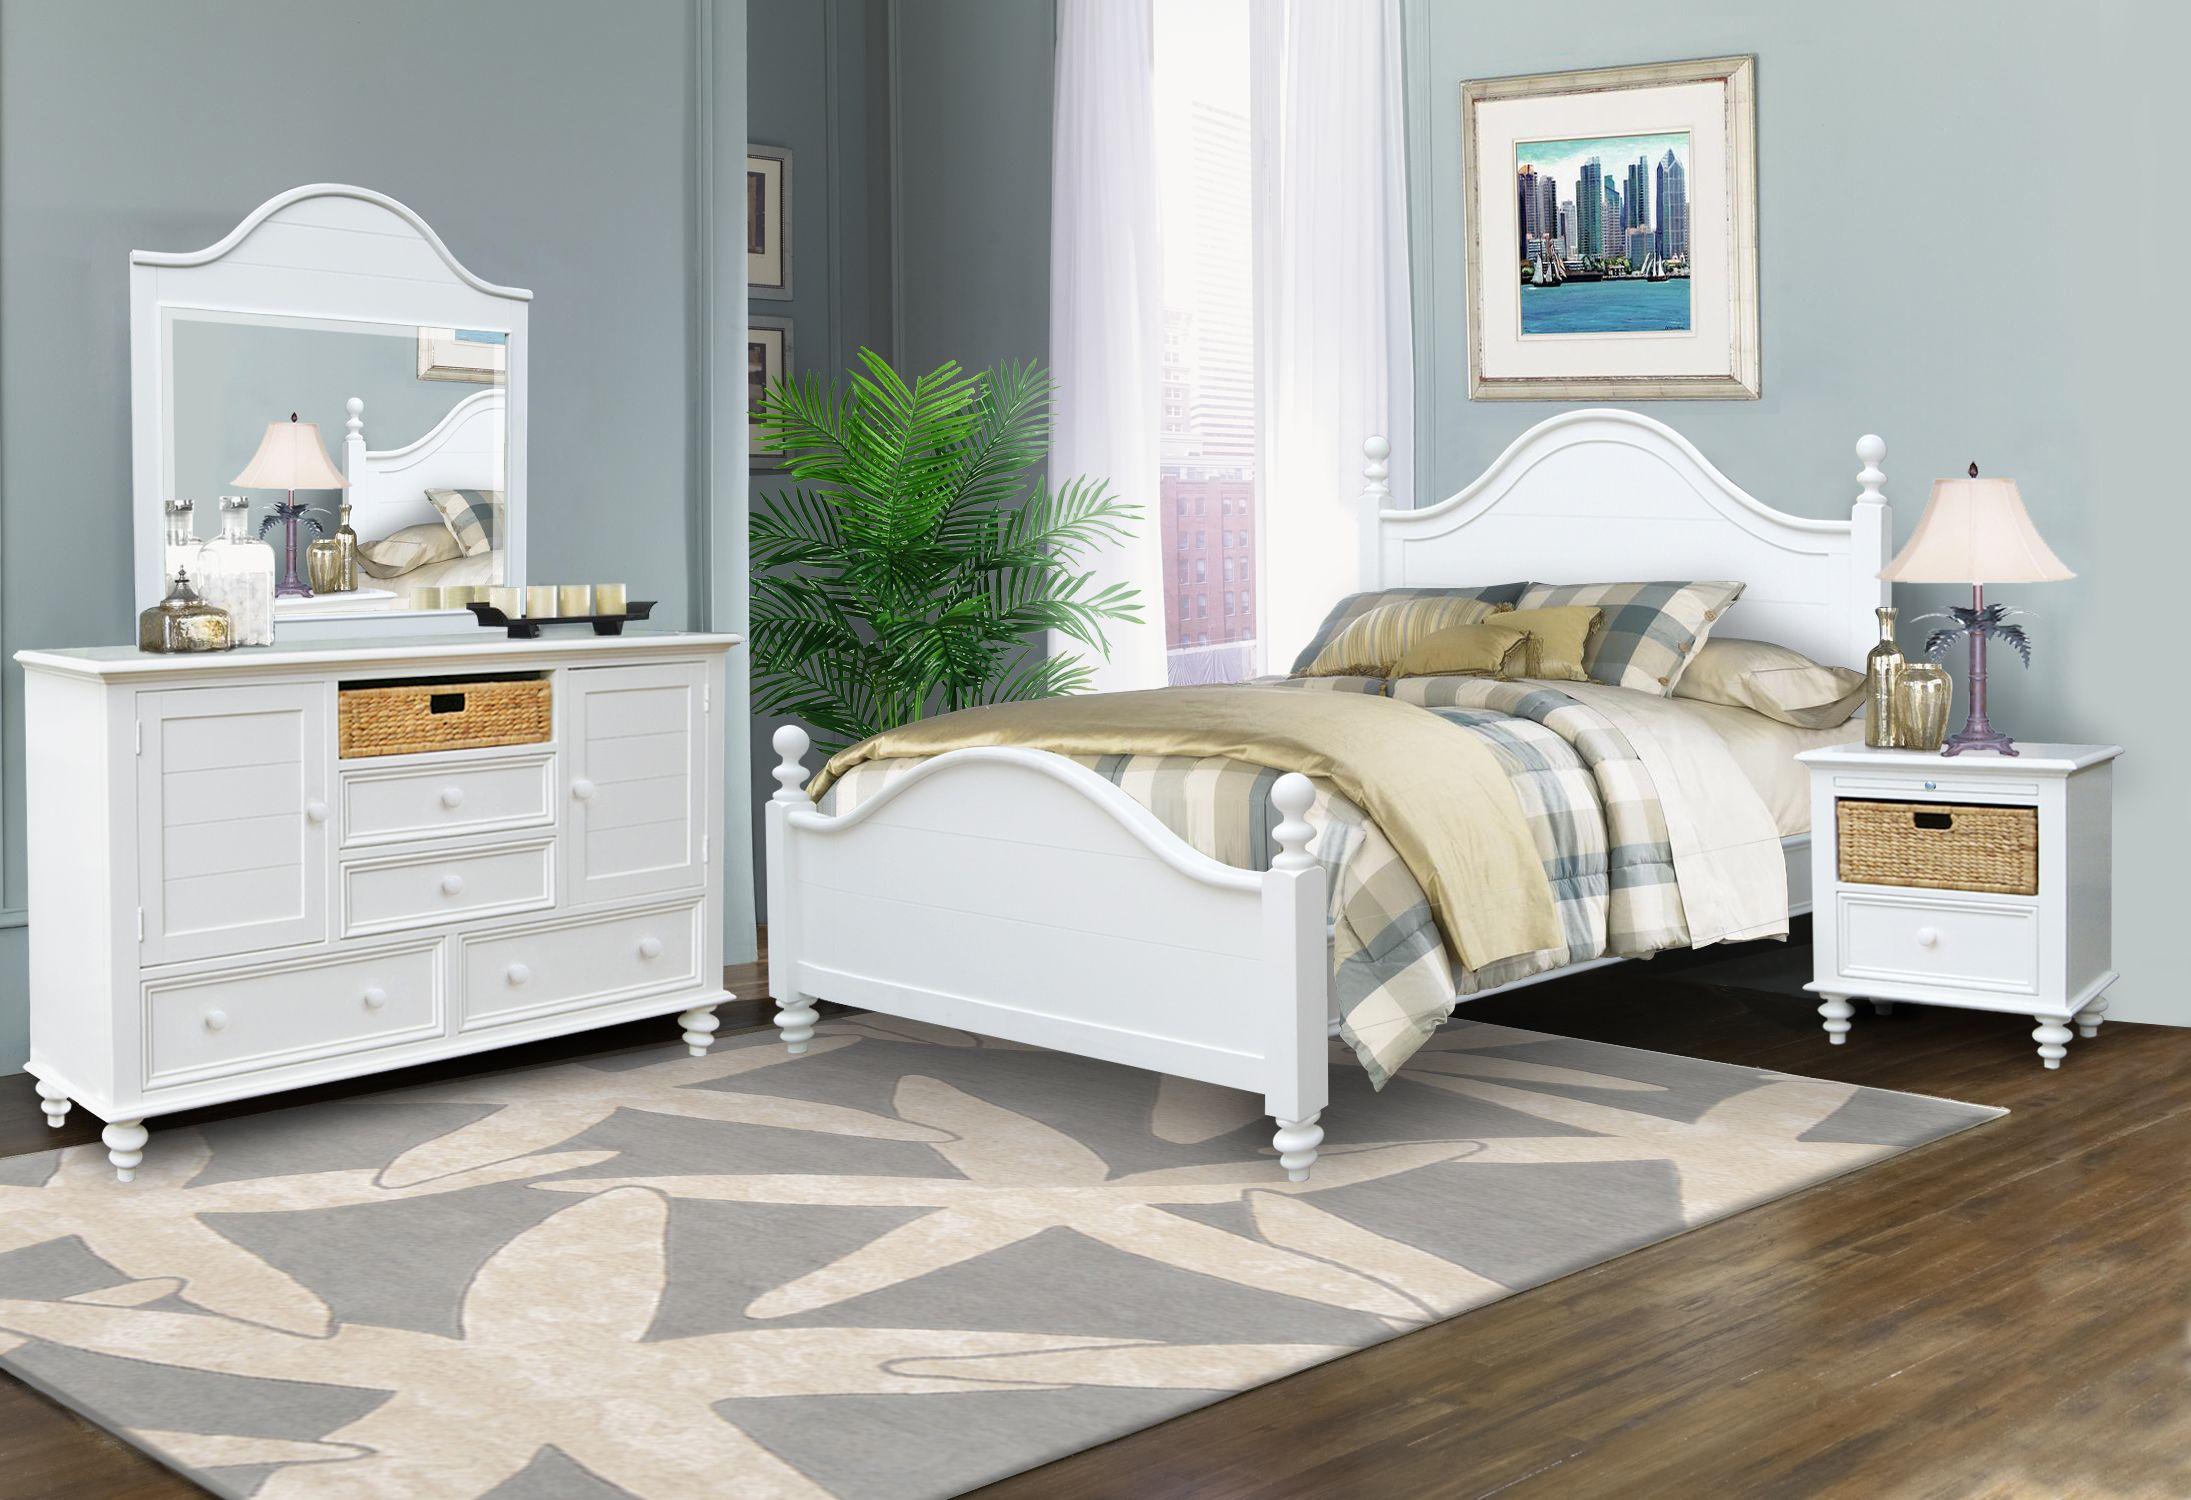 New cottage collection in roberts furniture u mattress williamsburg